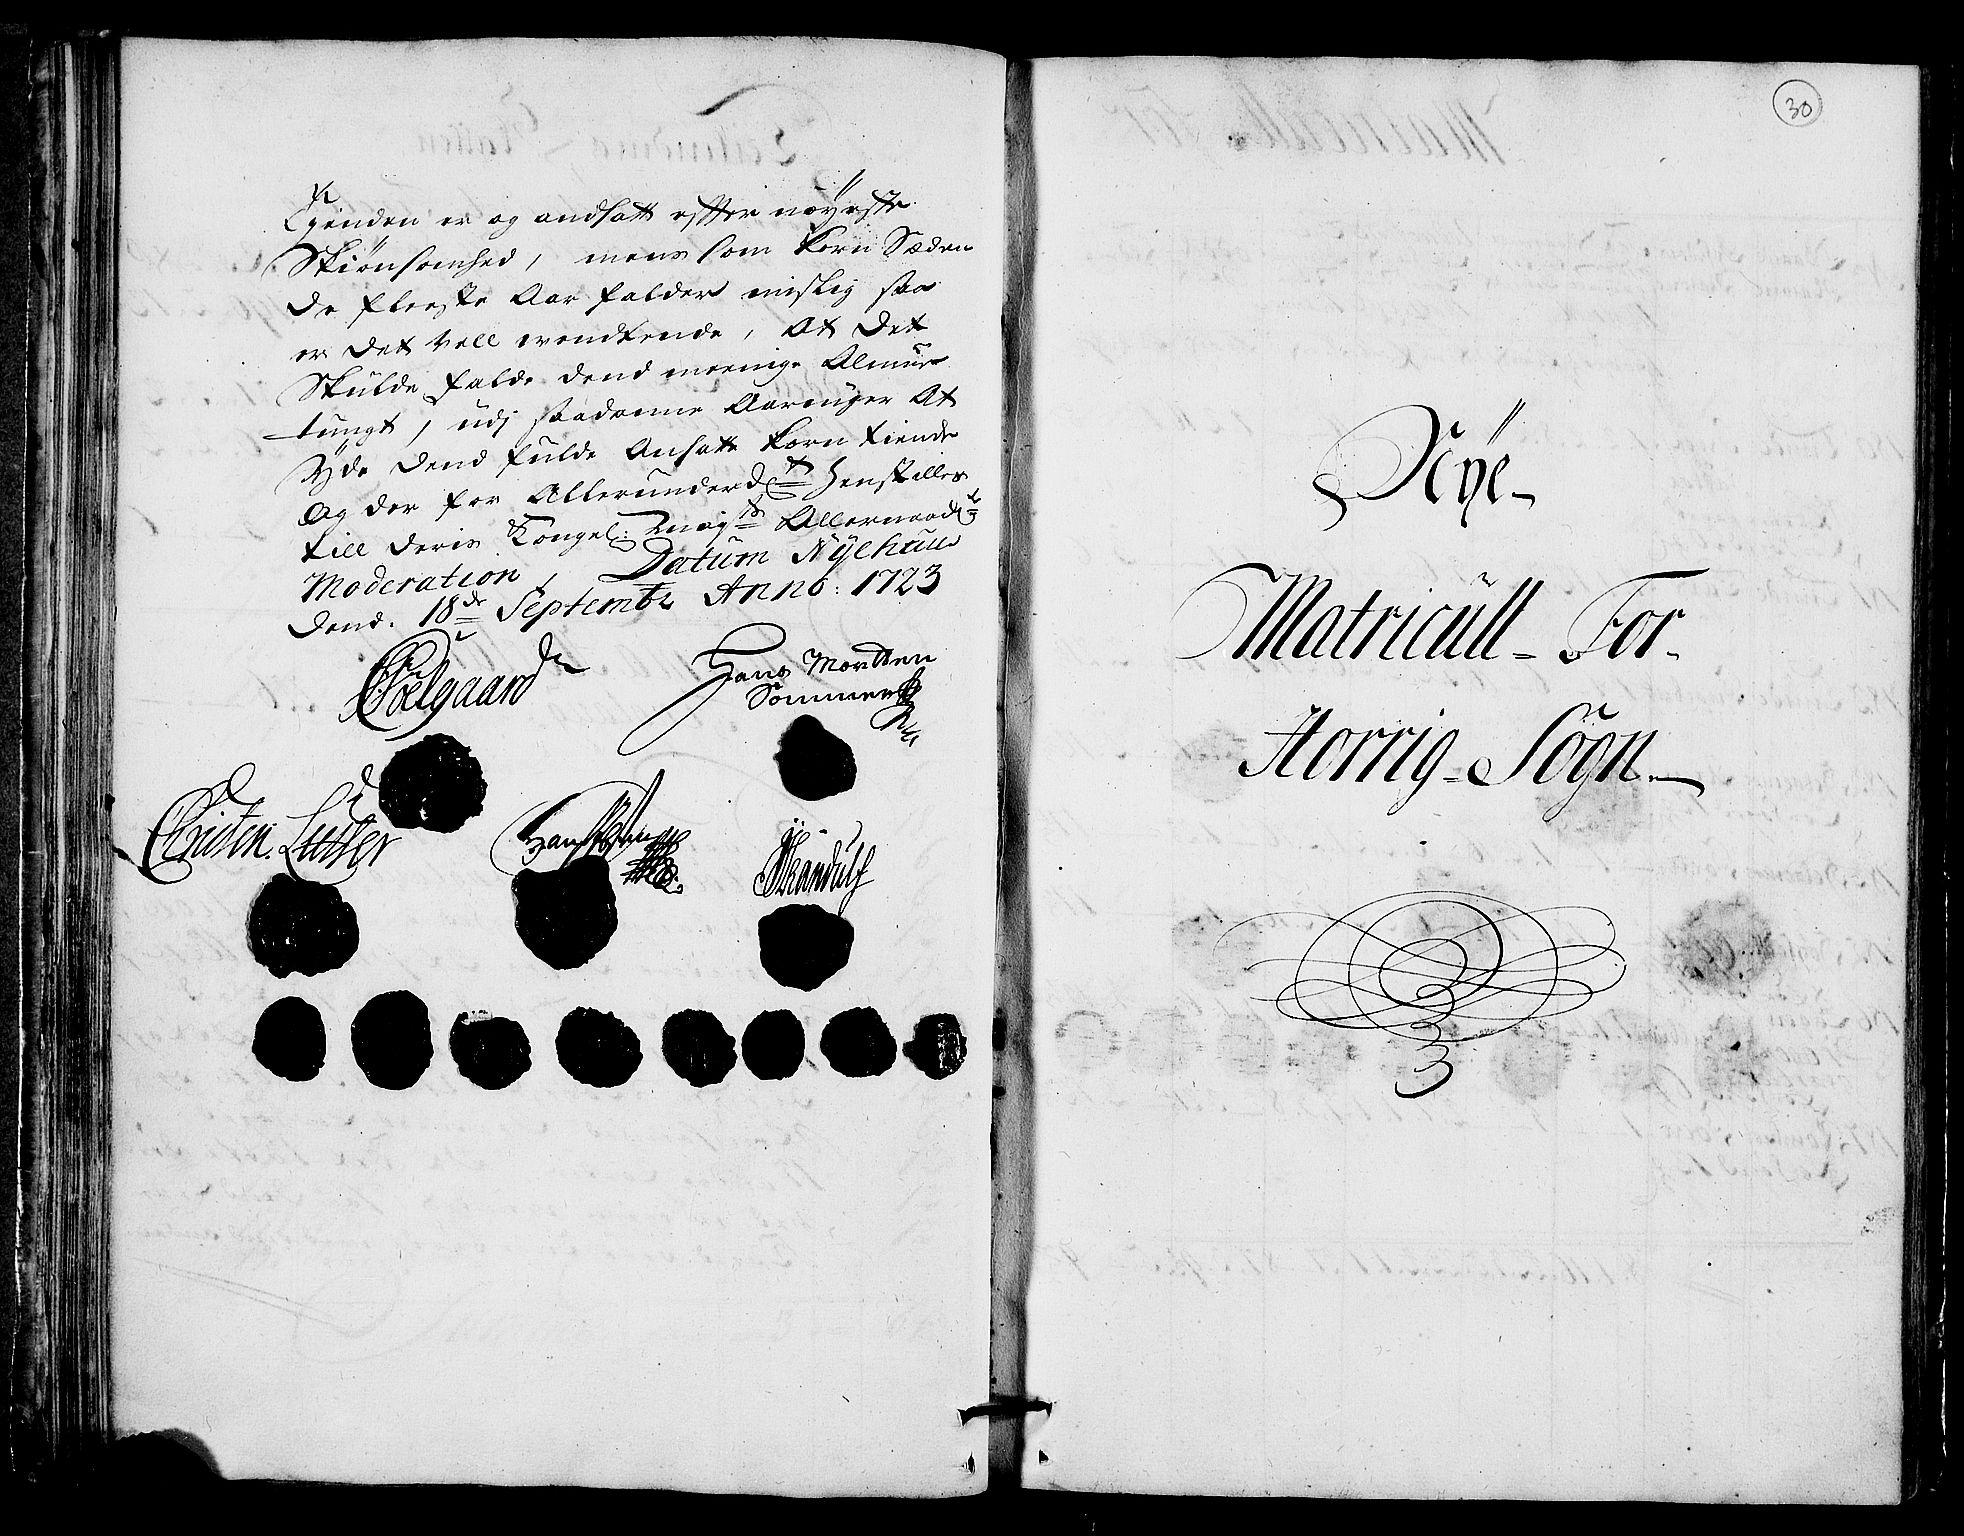 RA, Rentekammeret inntil 1814, Realistisk ordnet avdeling, N/Nb/Nbf/L0159: Gauldal matrikkelprotokoll, 1723, s. 29b-30a